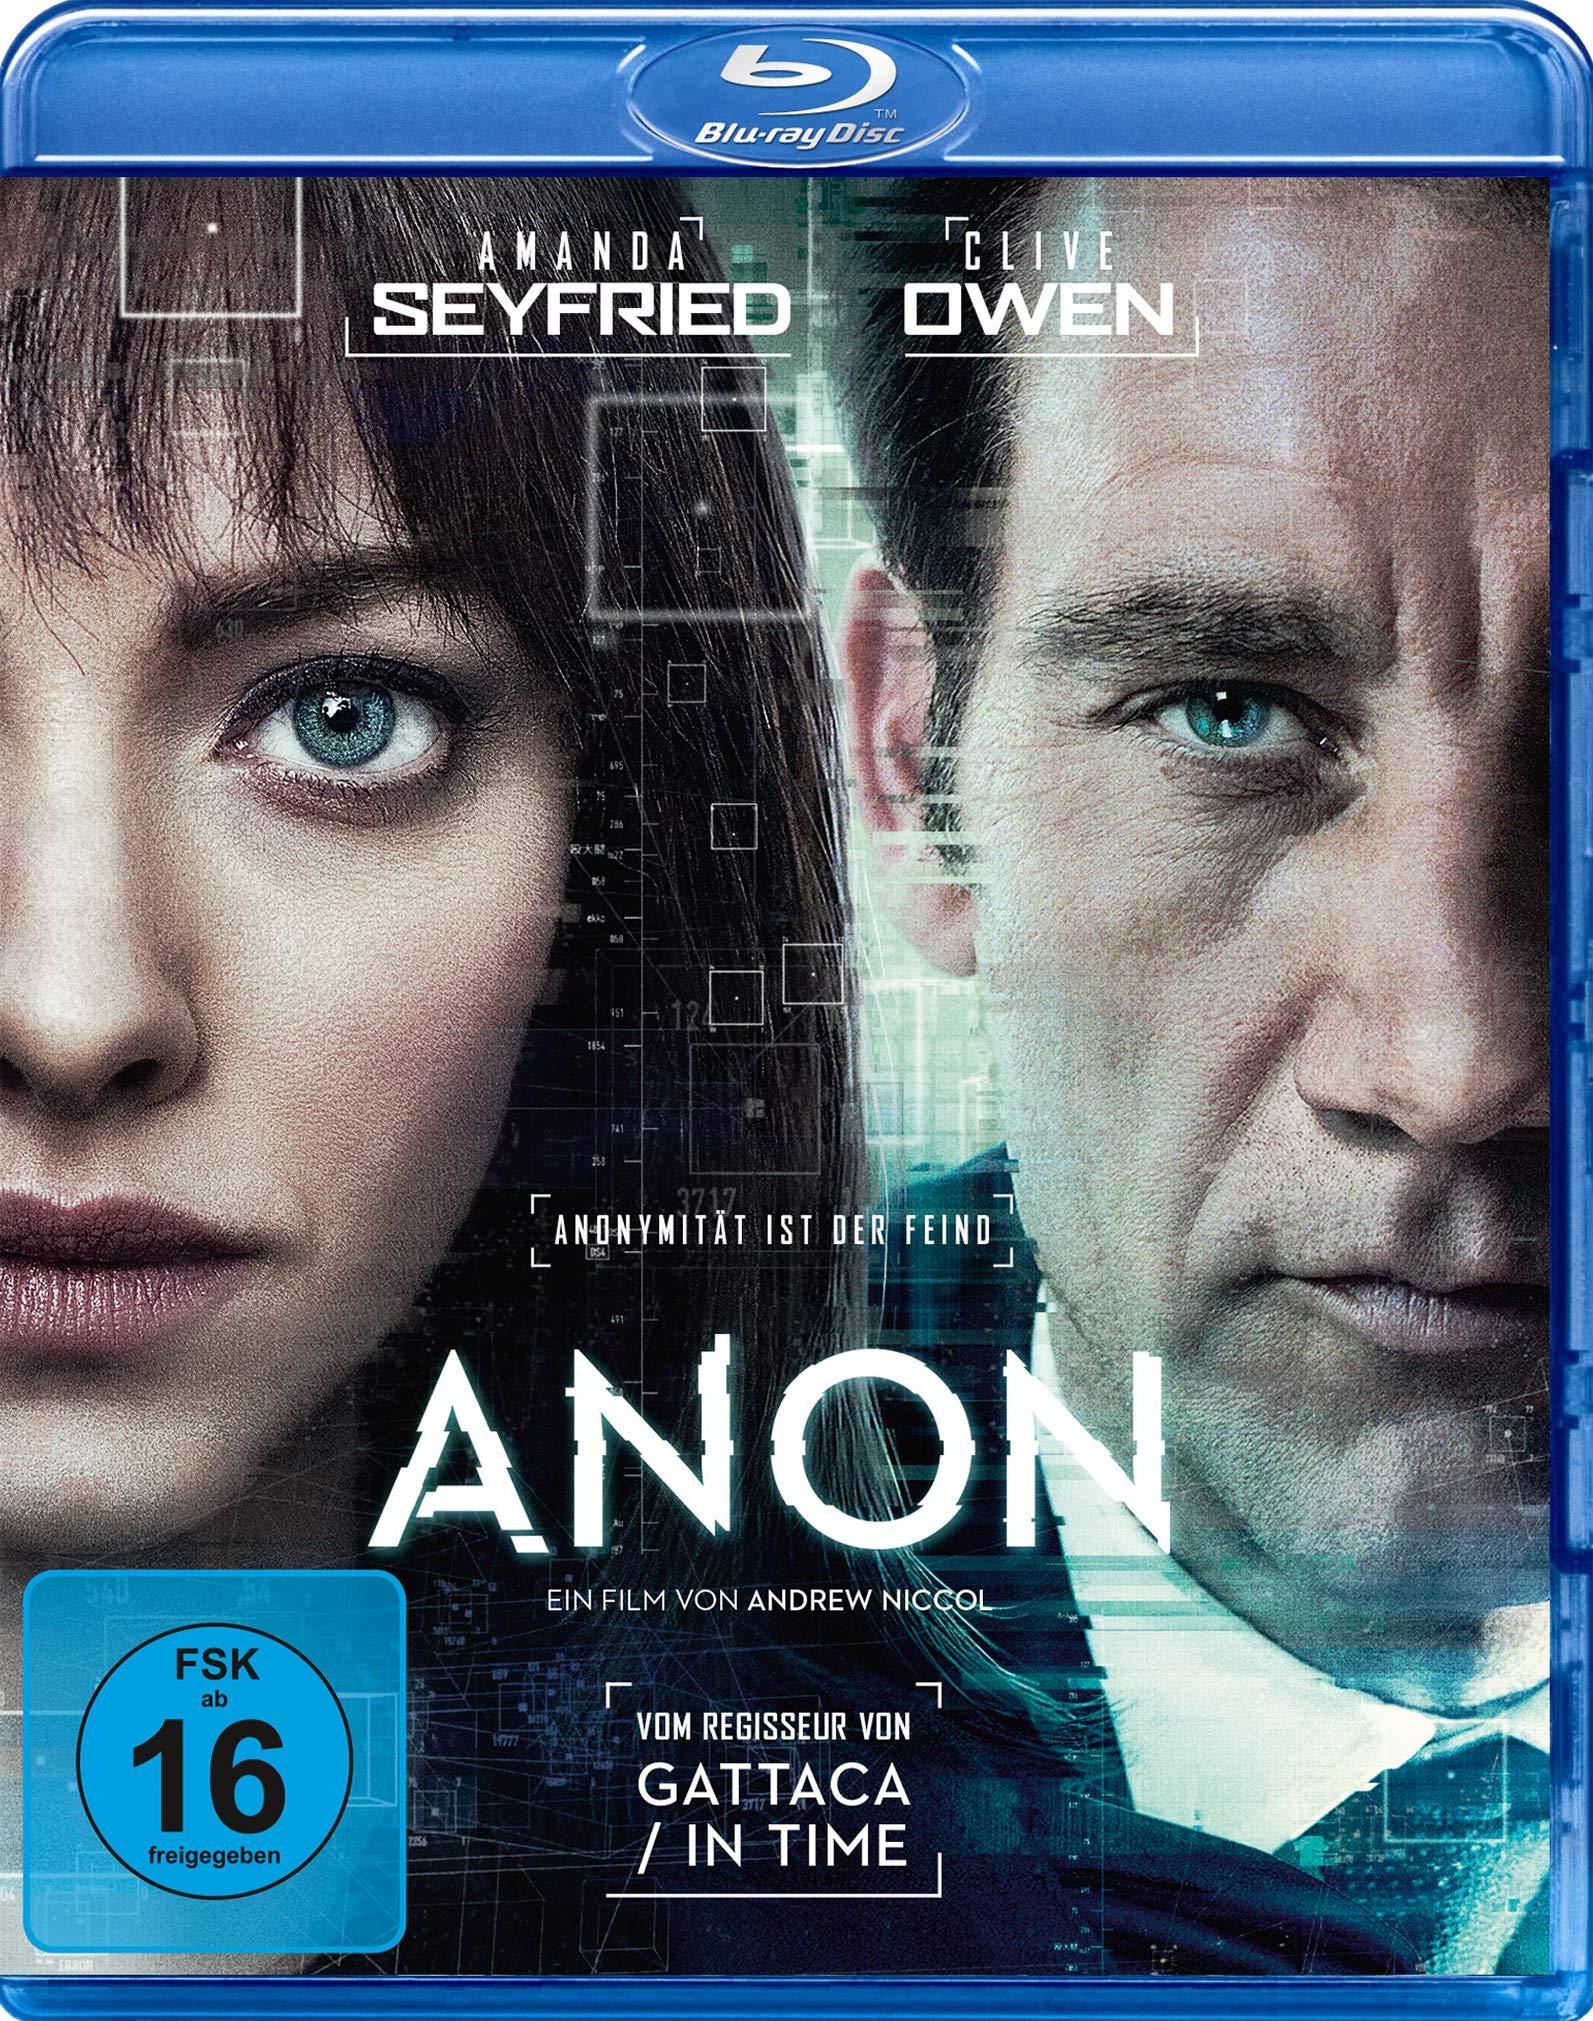 download Anon.2018.German.WEBRip.AC3.x264-CiNEDOME